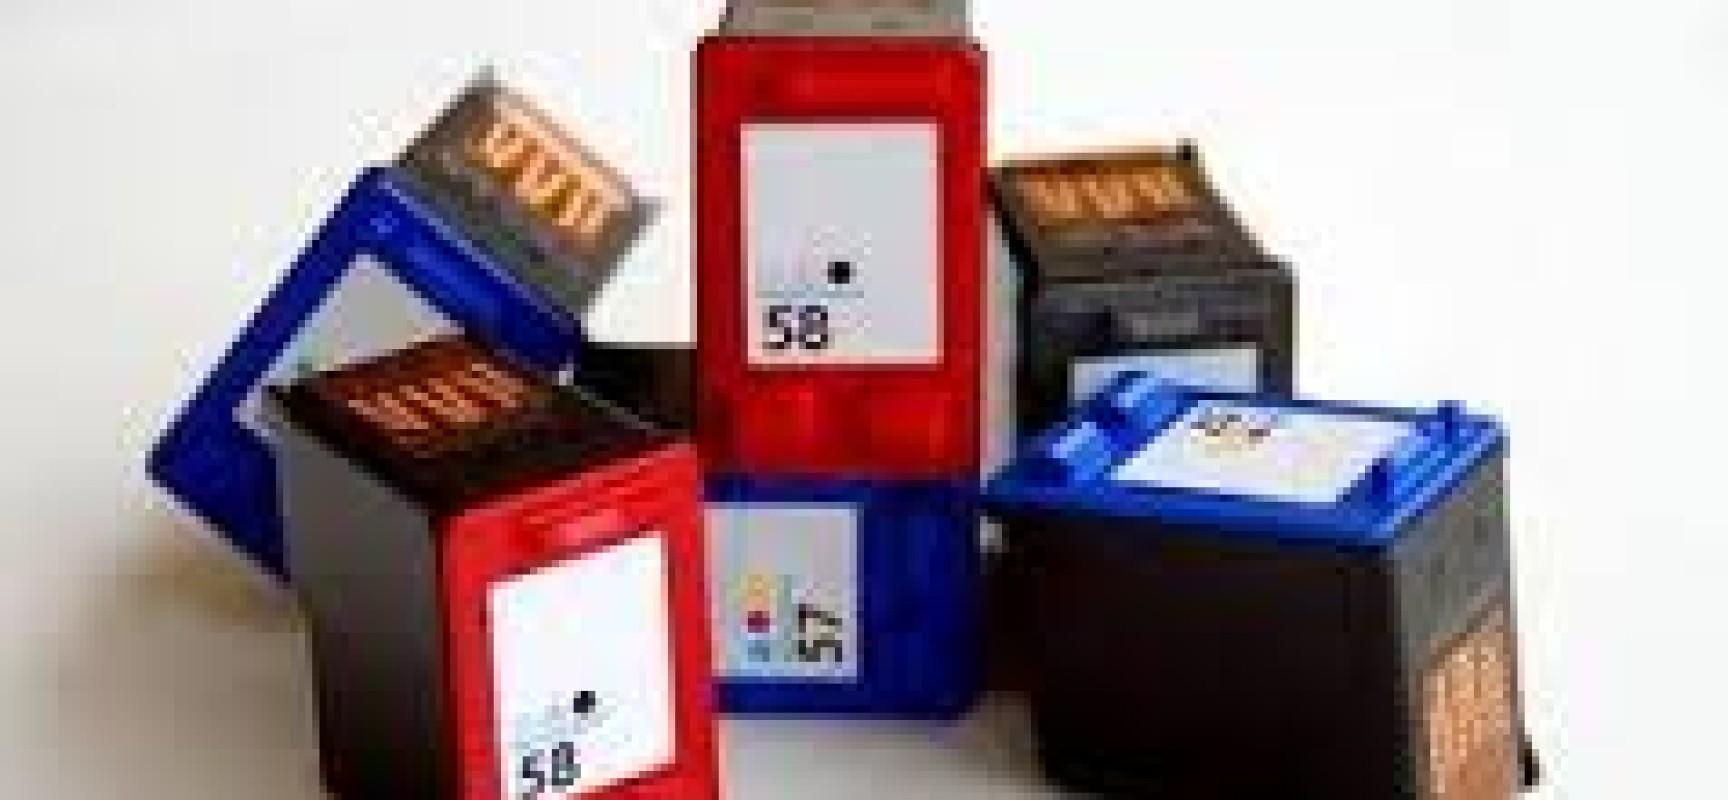 Prolong the life of printer cartridges